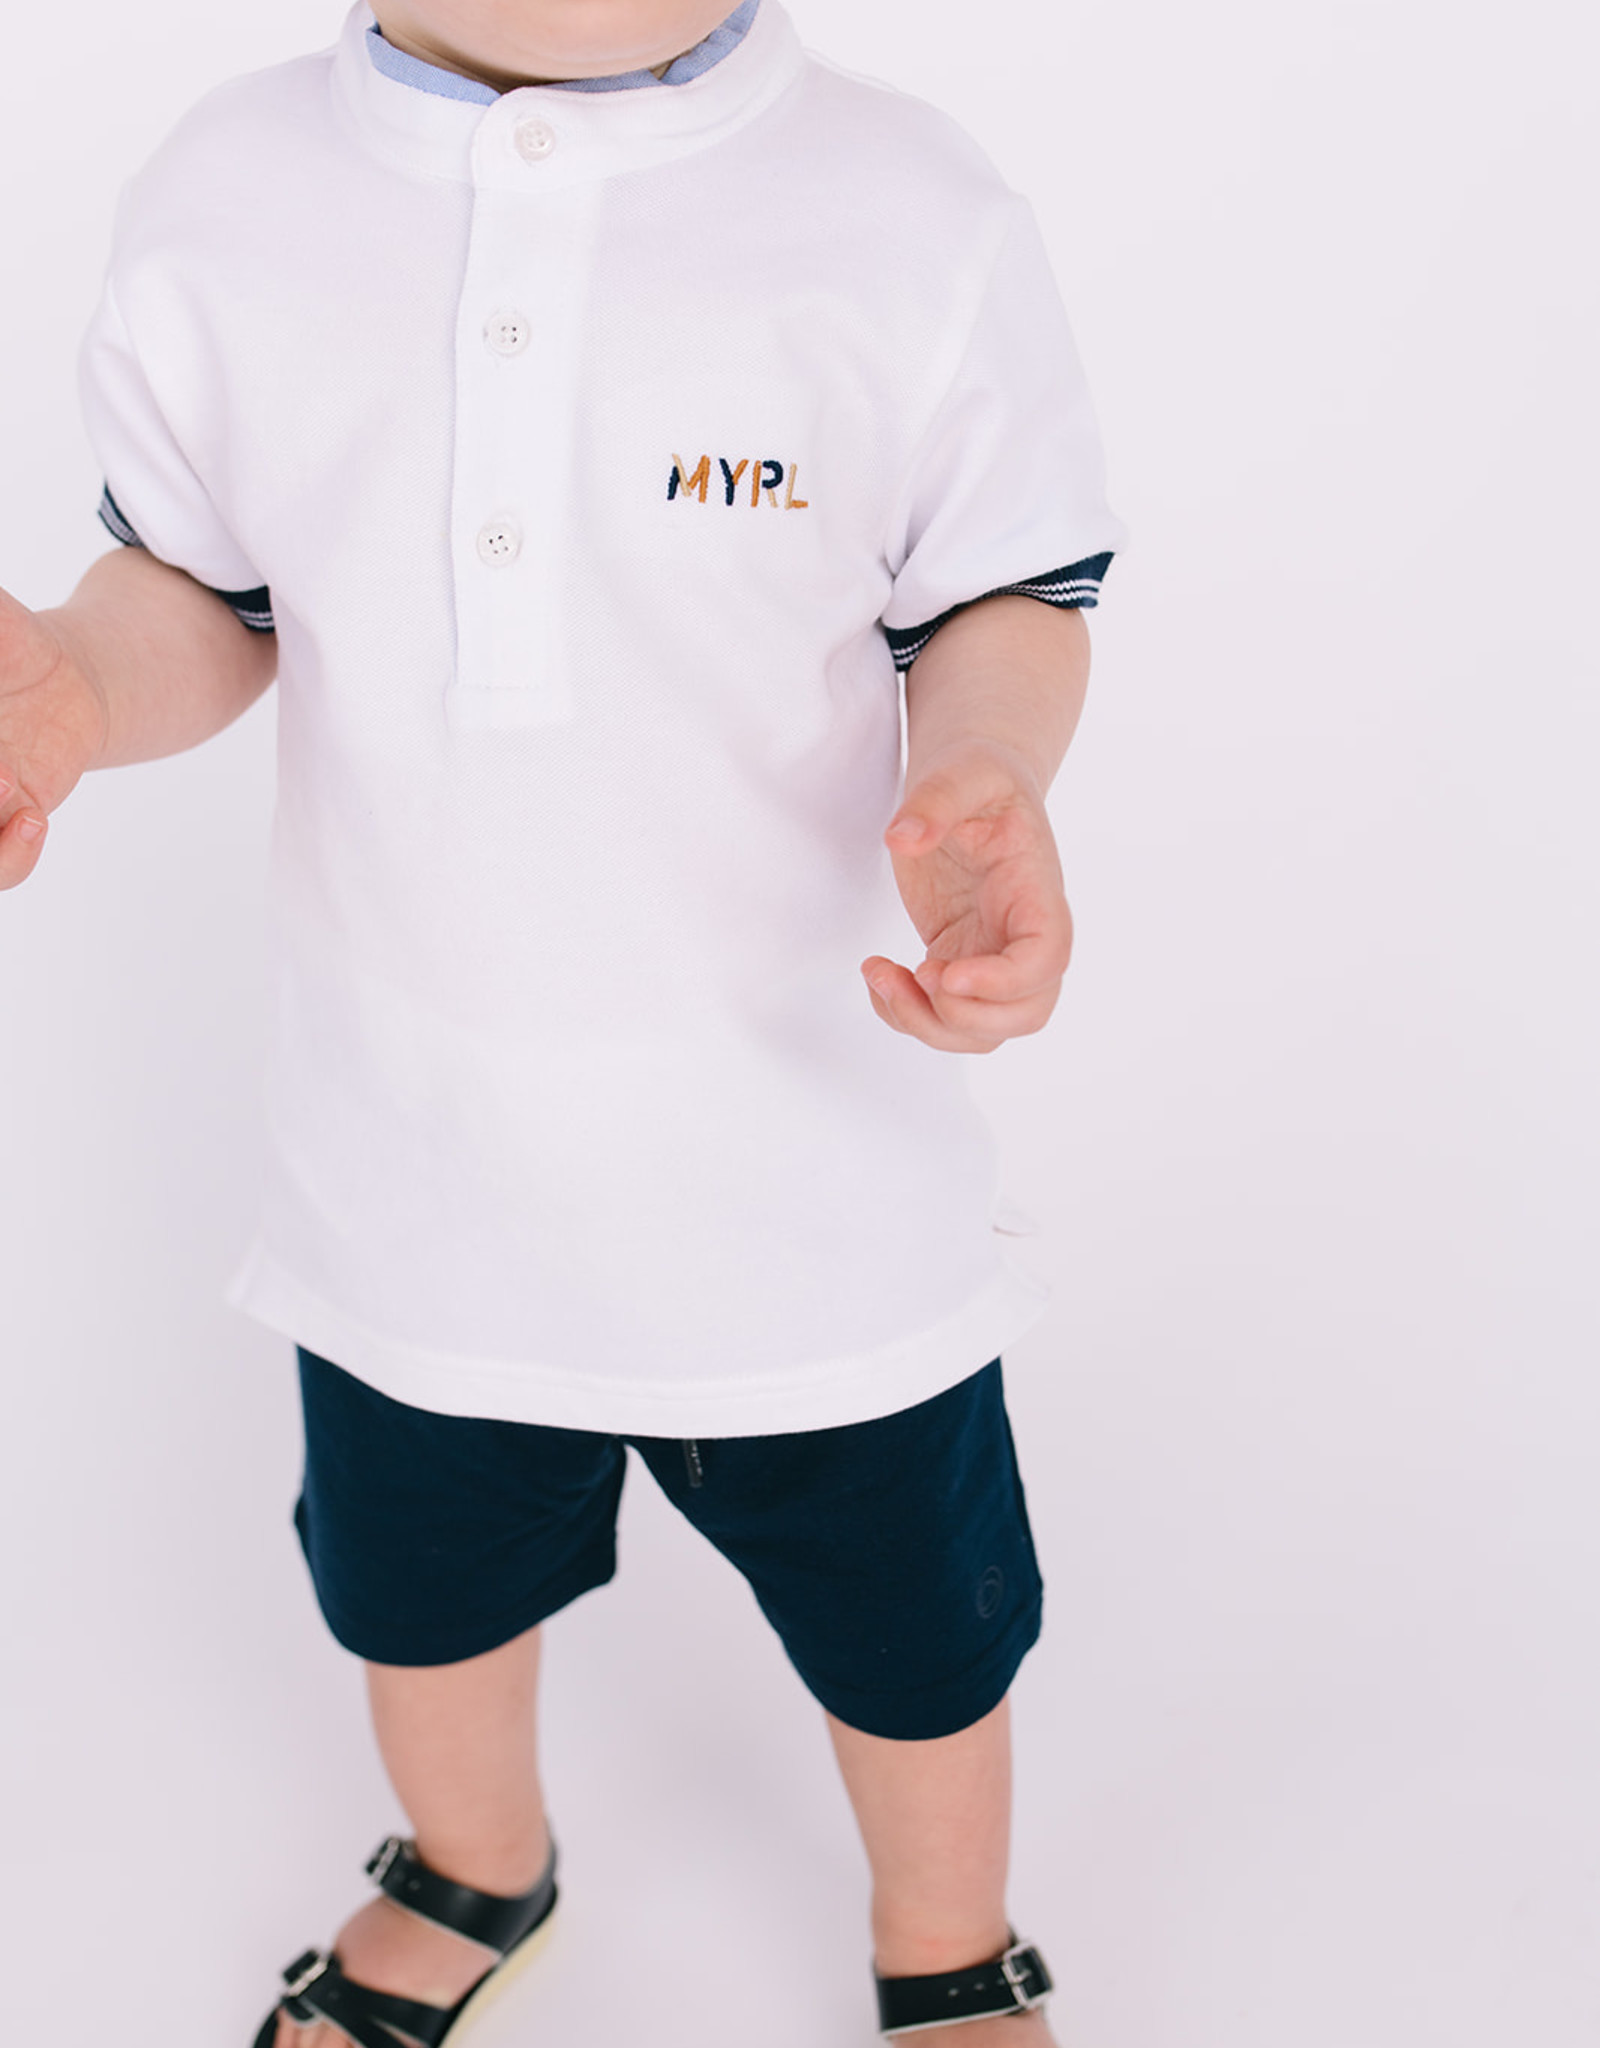 Mayoral White Band Collar Polo MYRL Logo